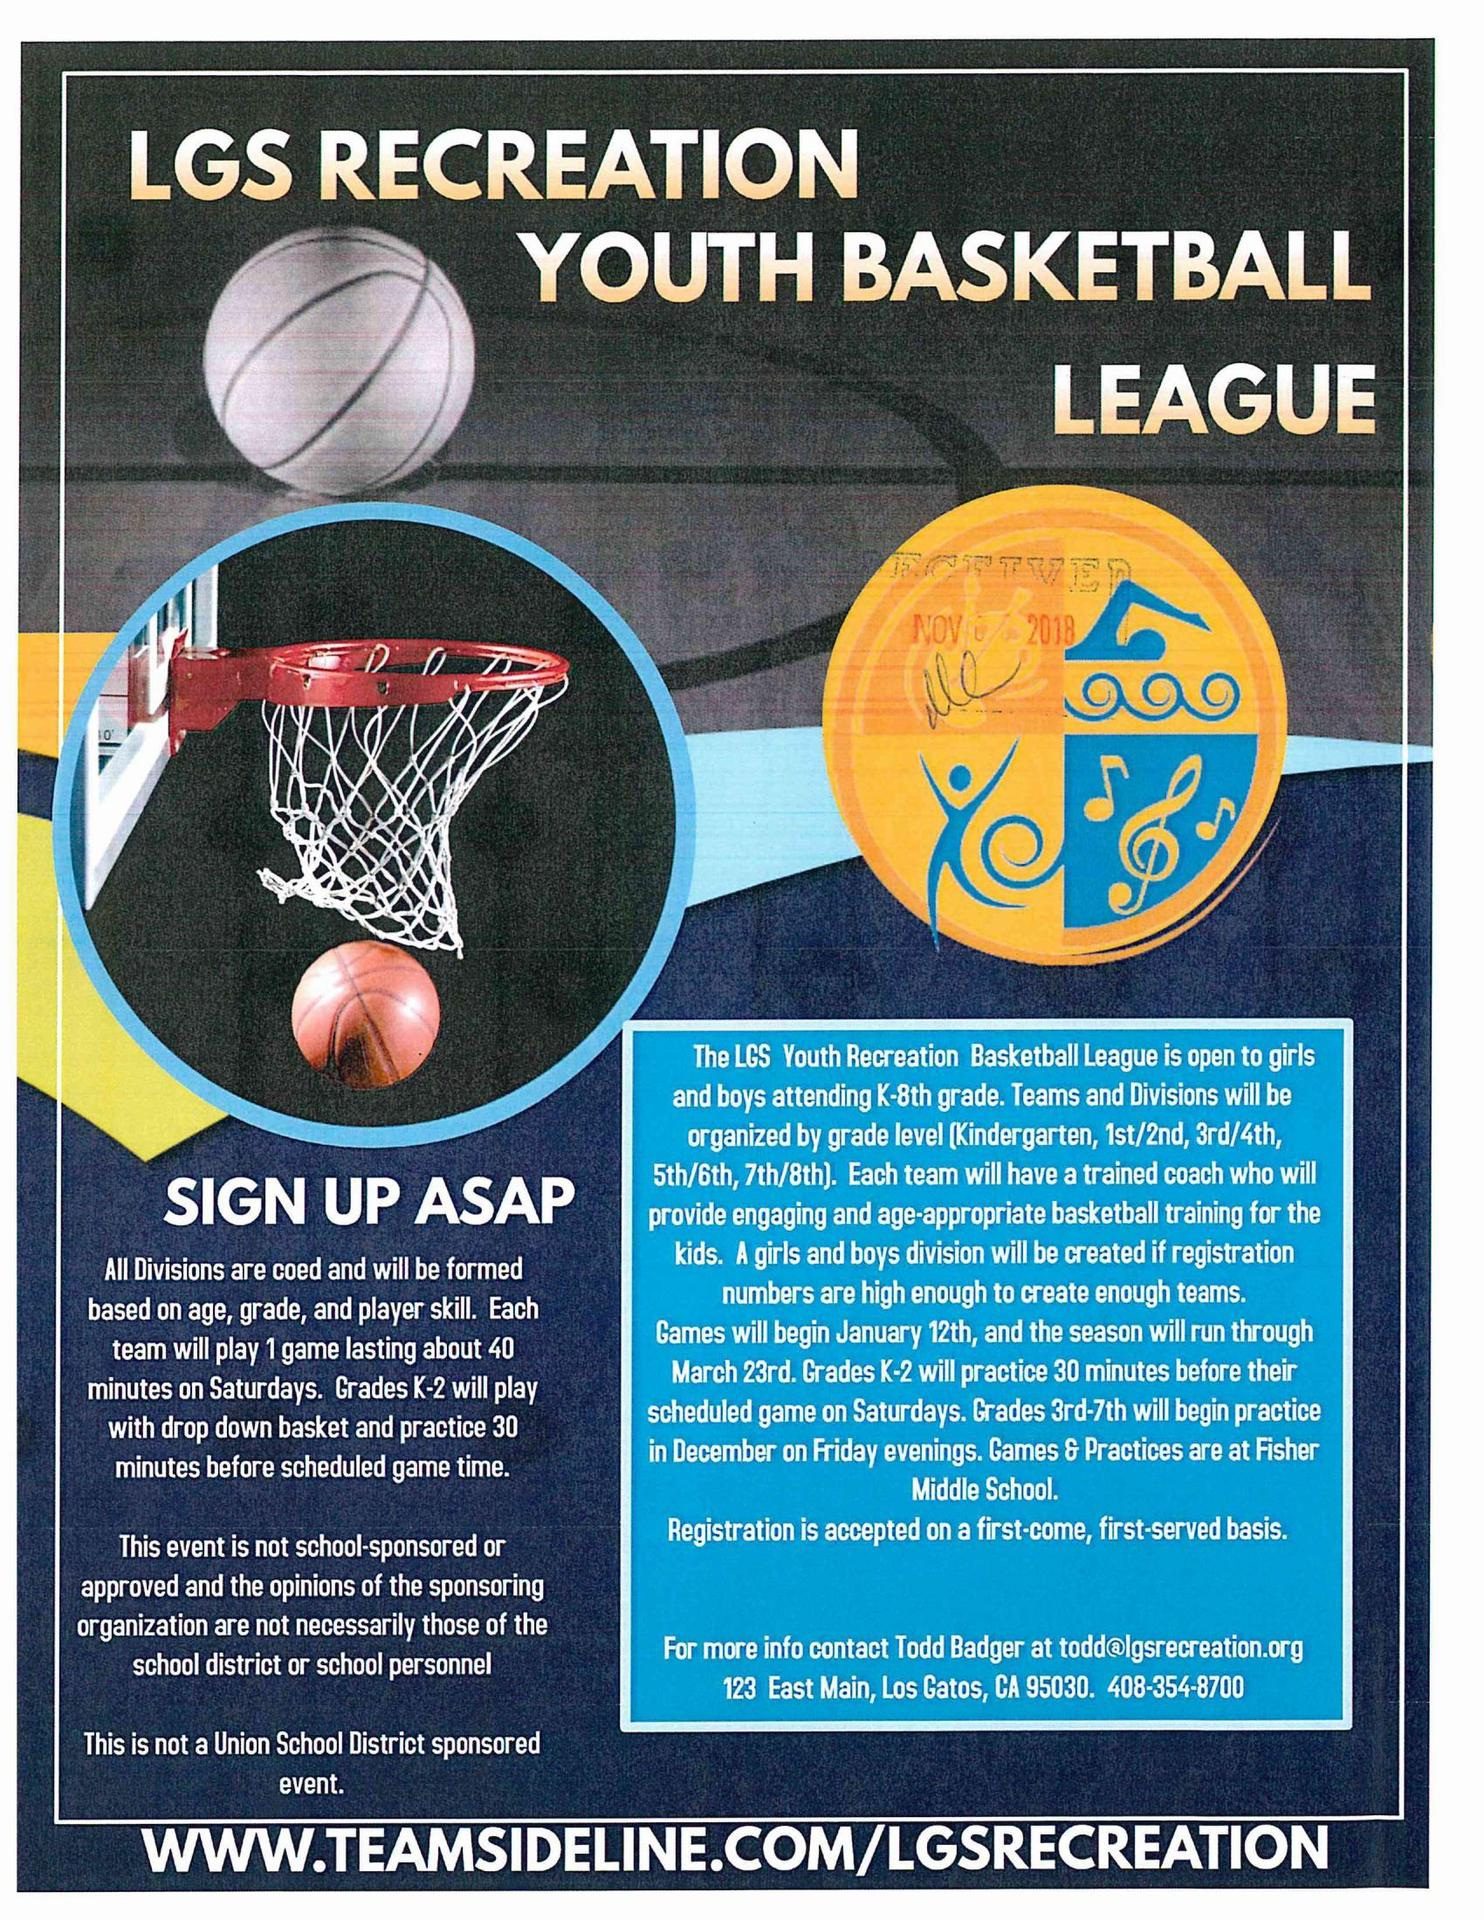 LGS Recreation Youth Basketball League